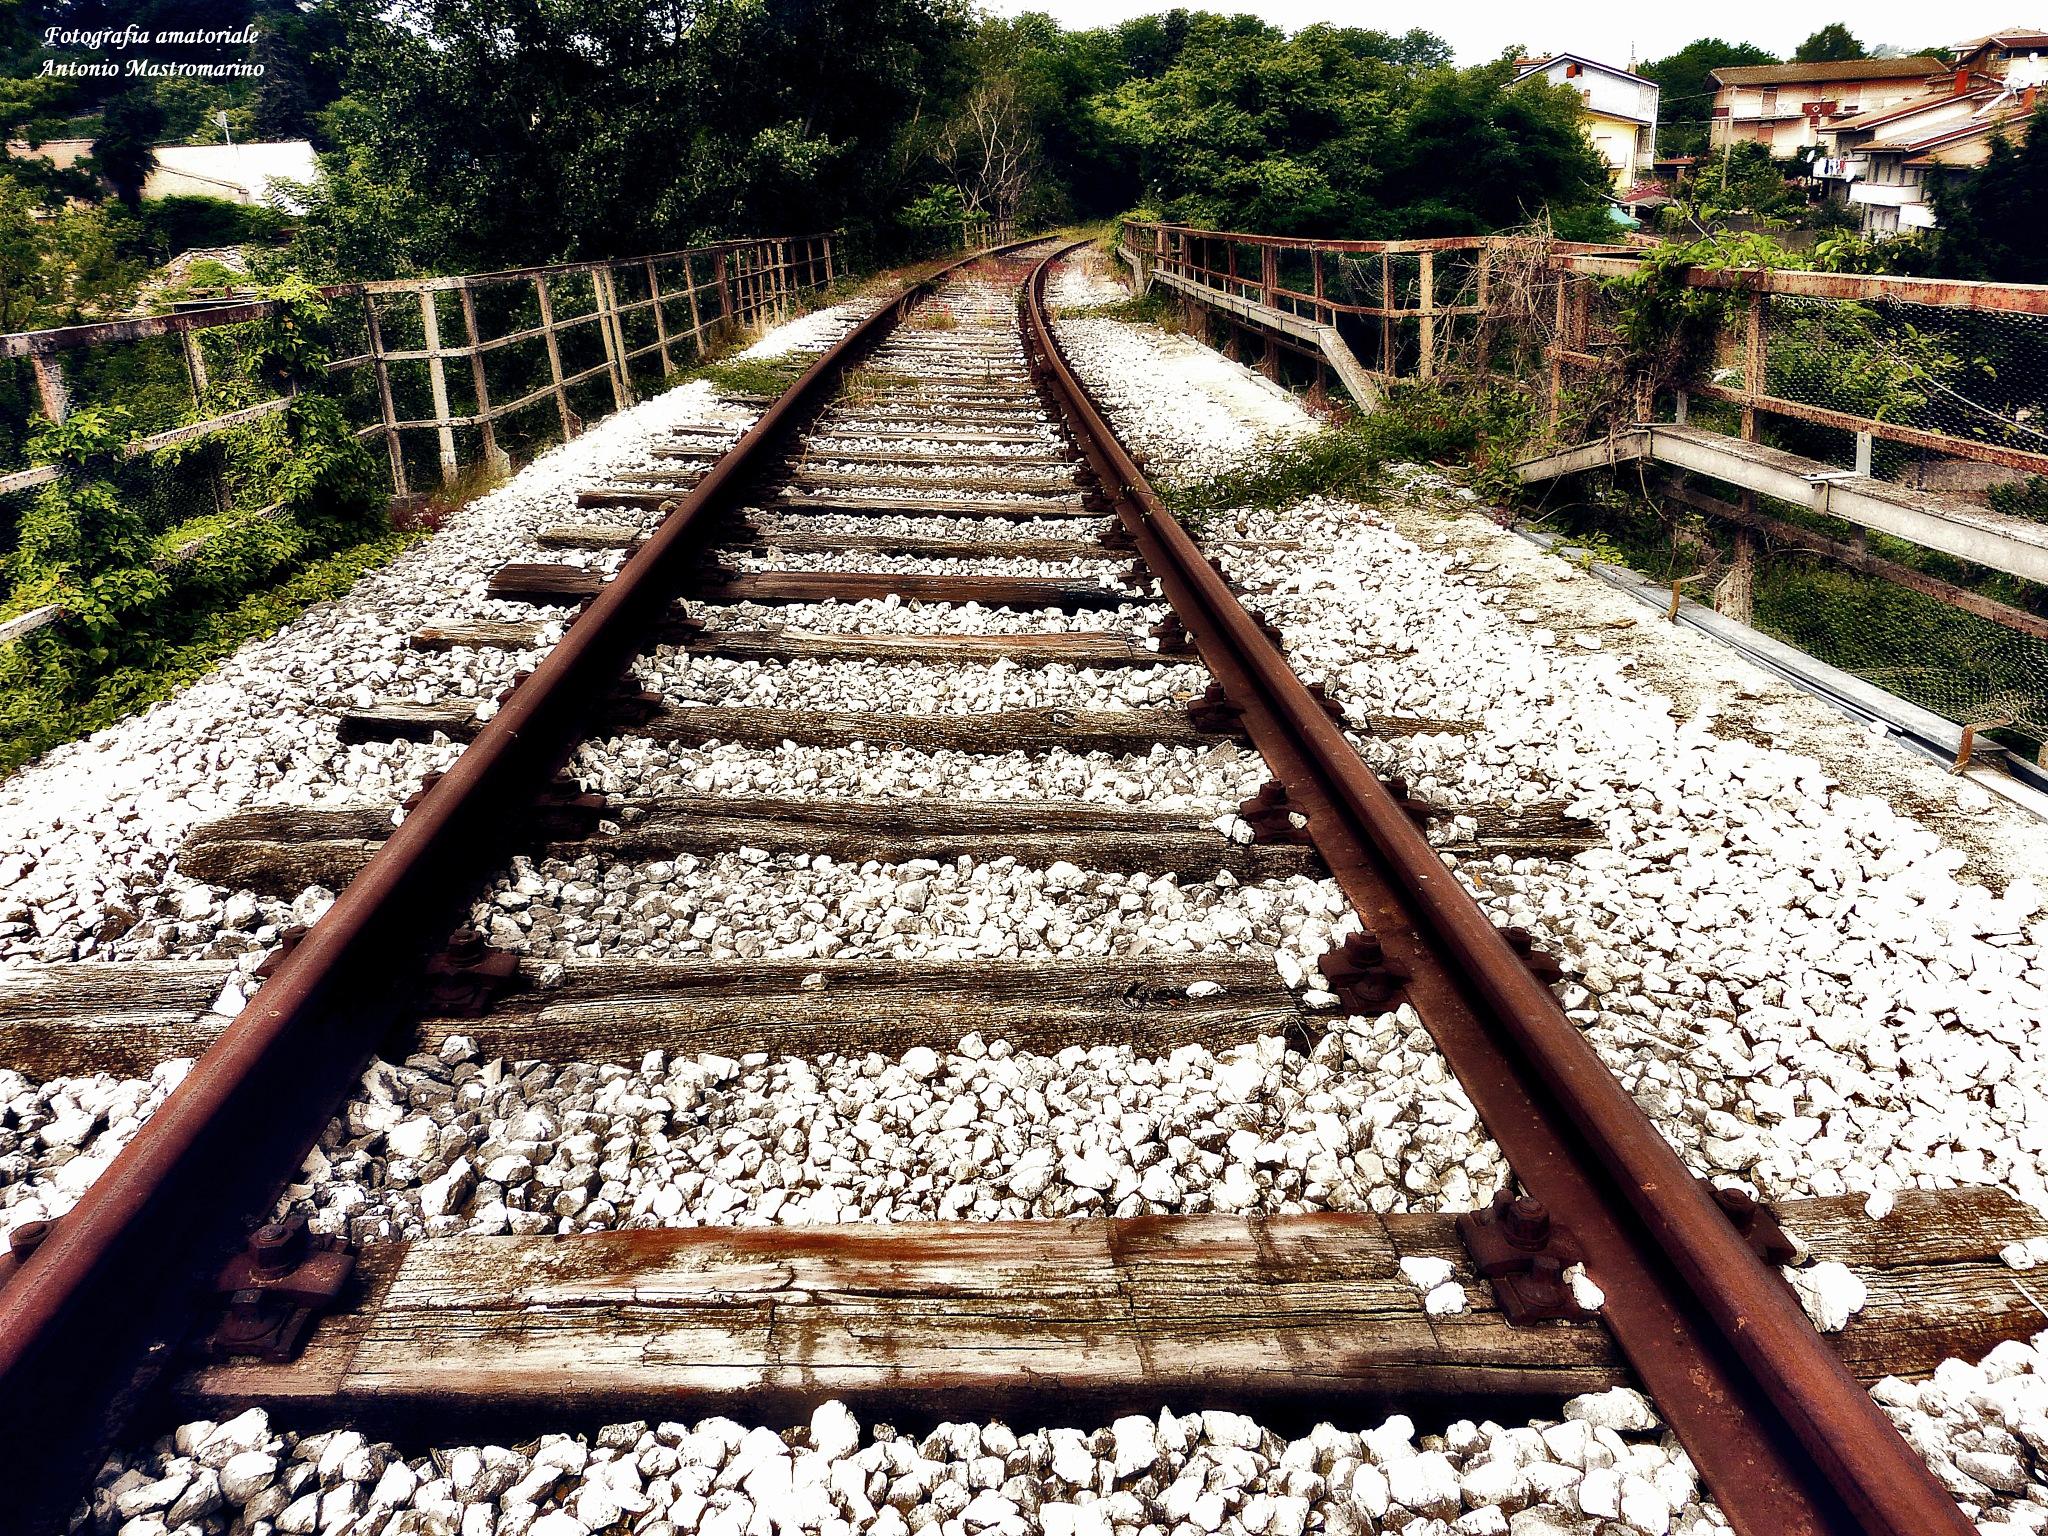 linea ferroviaria Rocchetta Sant'Antonio Atripalda by antonio mastromarino